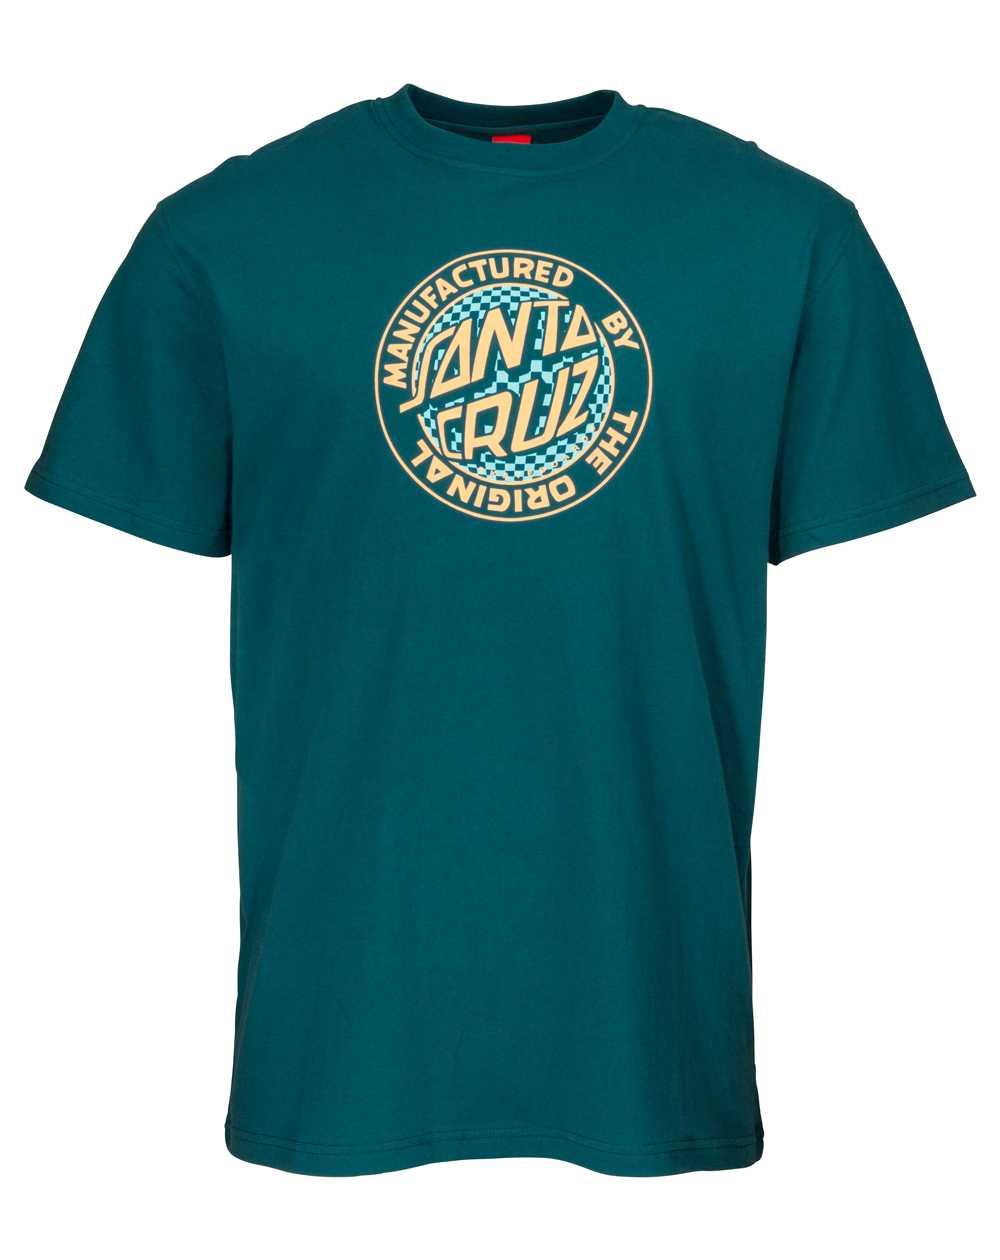 Santa Cruz Men's T-Shirt Fisheye MFG Ink Blue